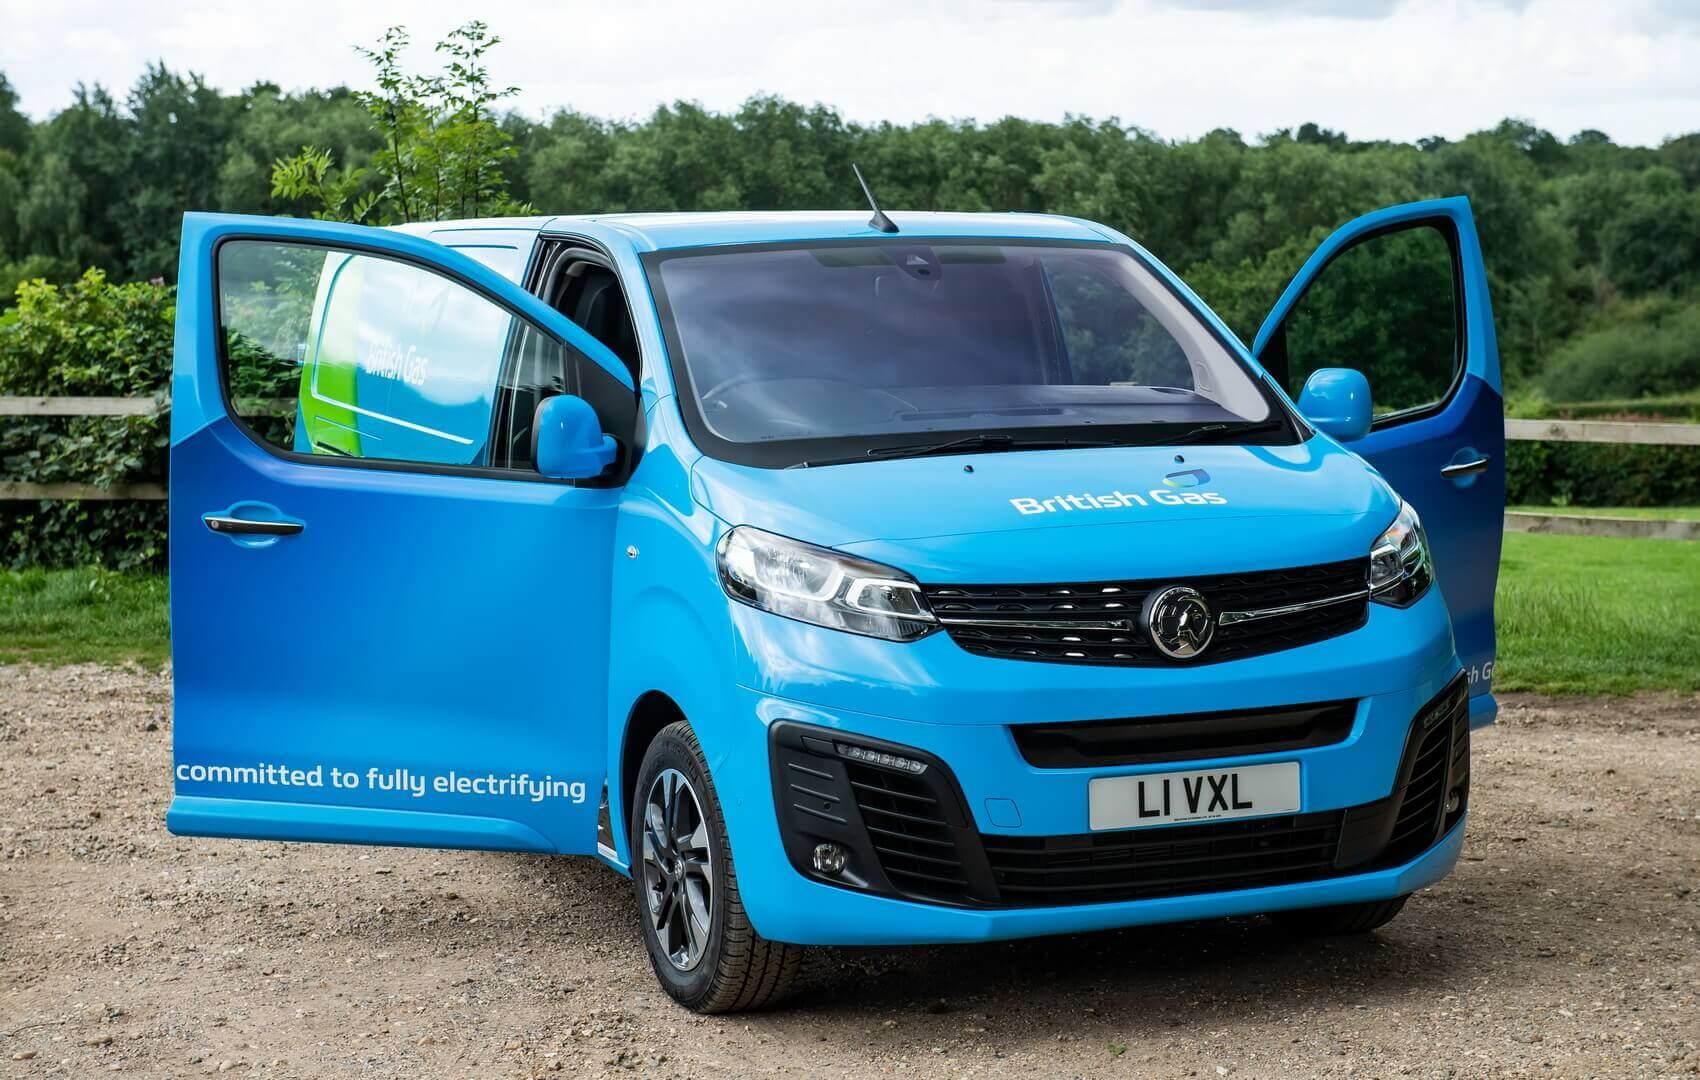 Компания British Gas заказала у Vauxhall 1000 электрических фургонов Vivaro-e